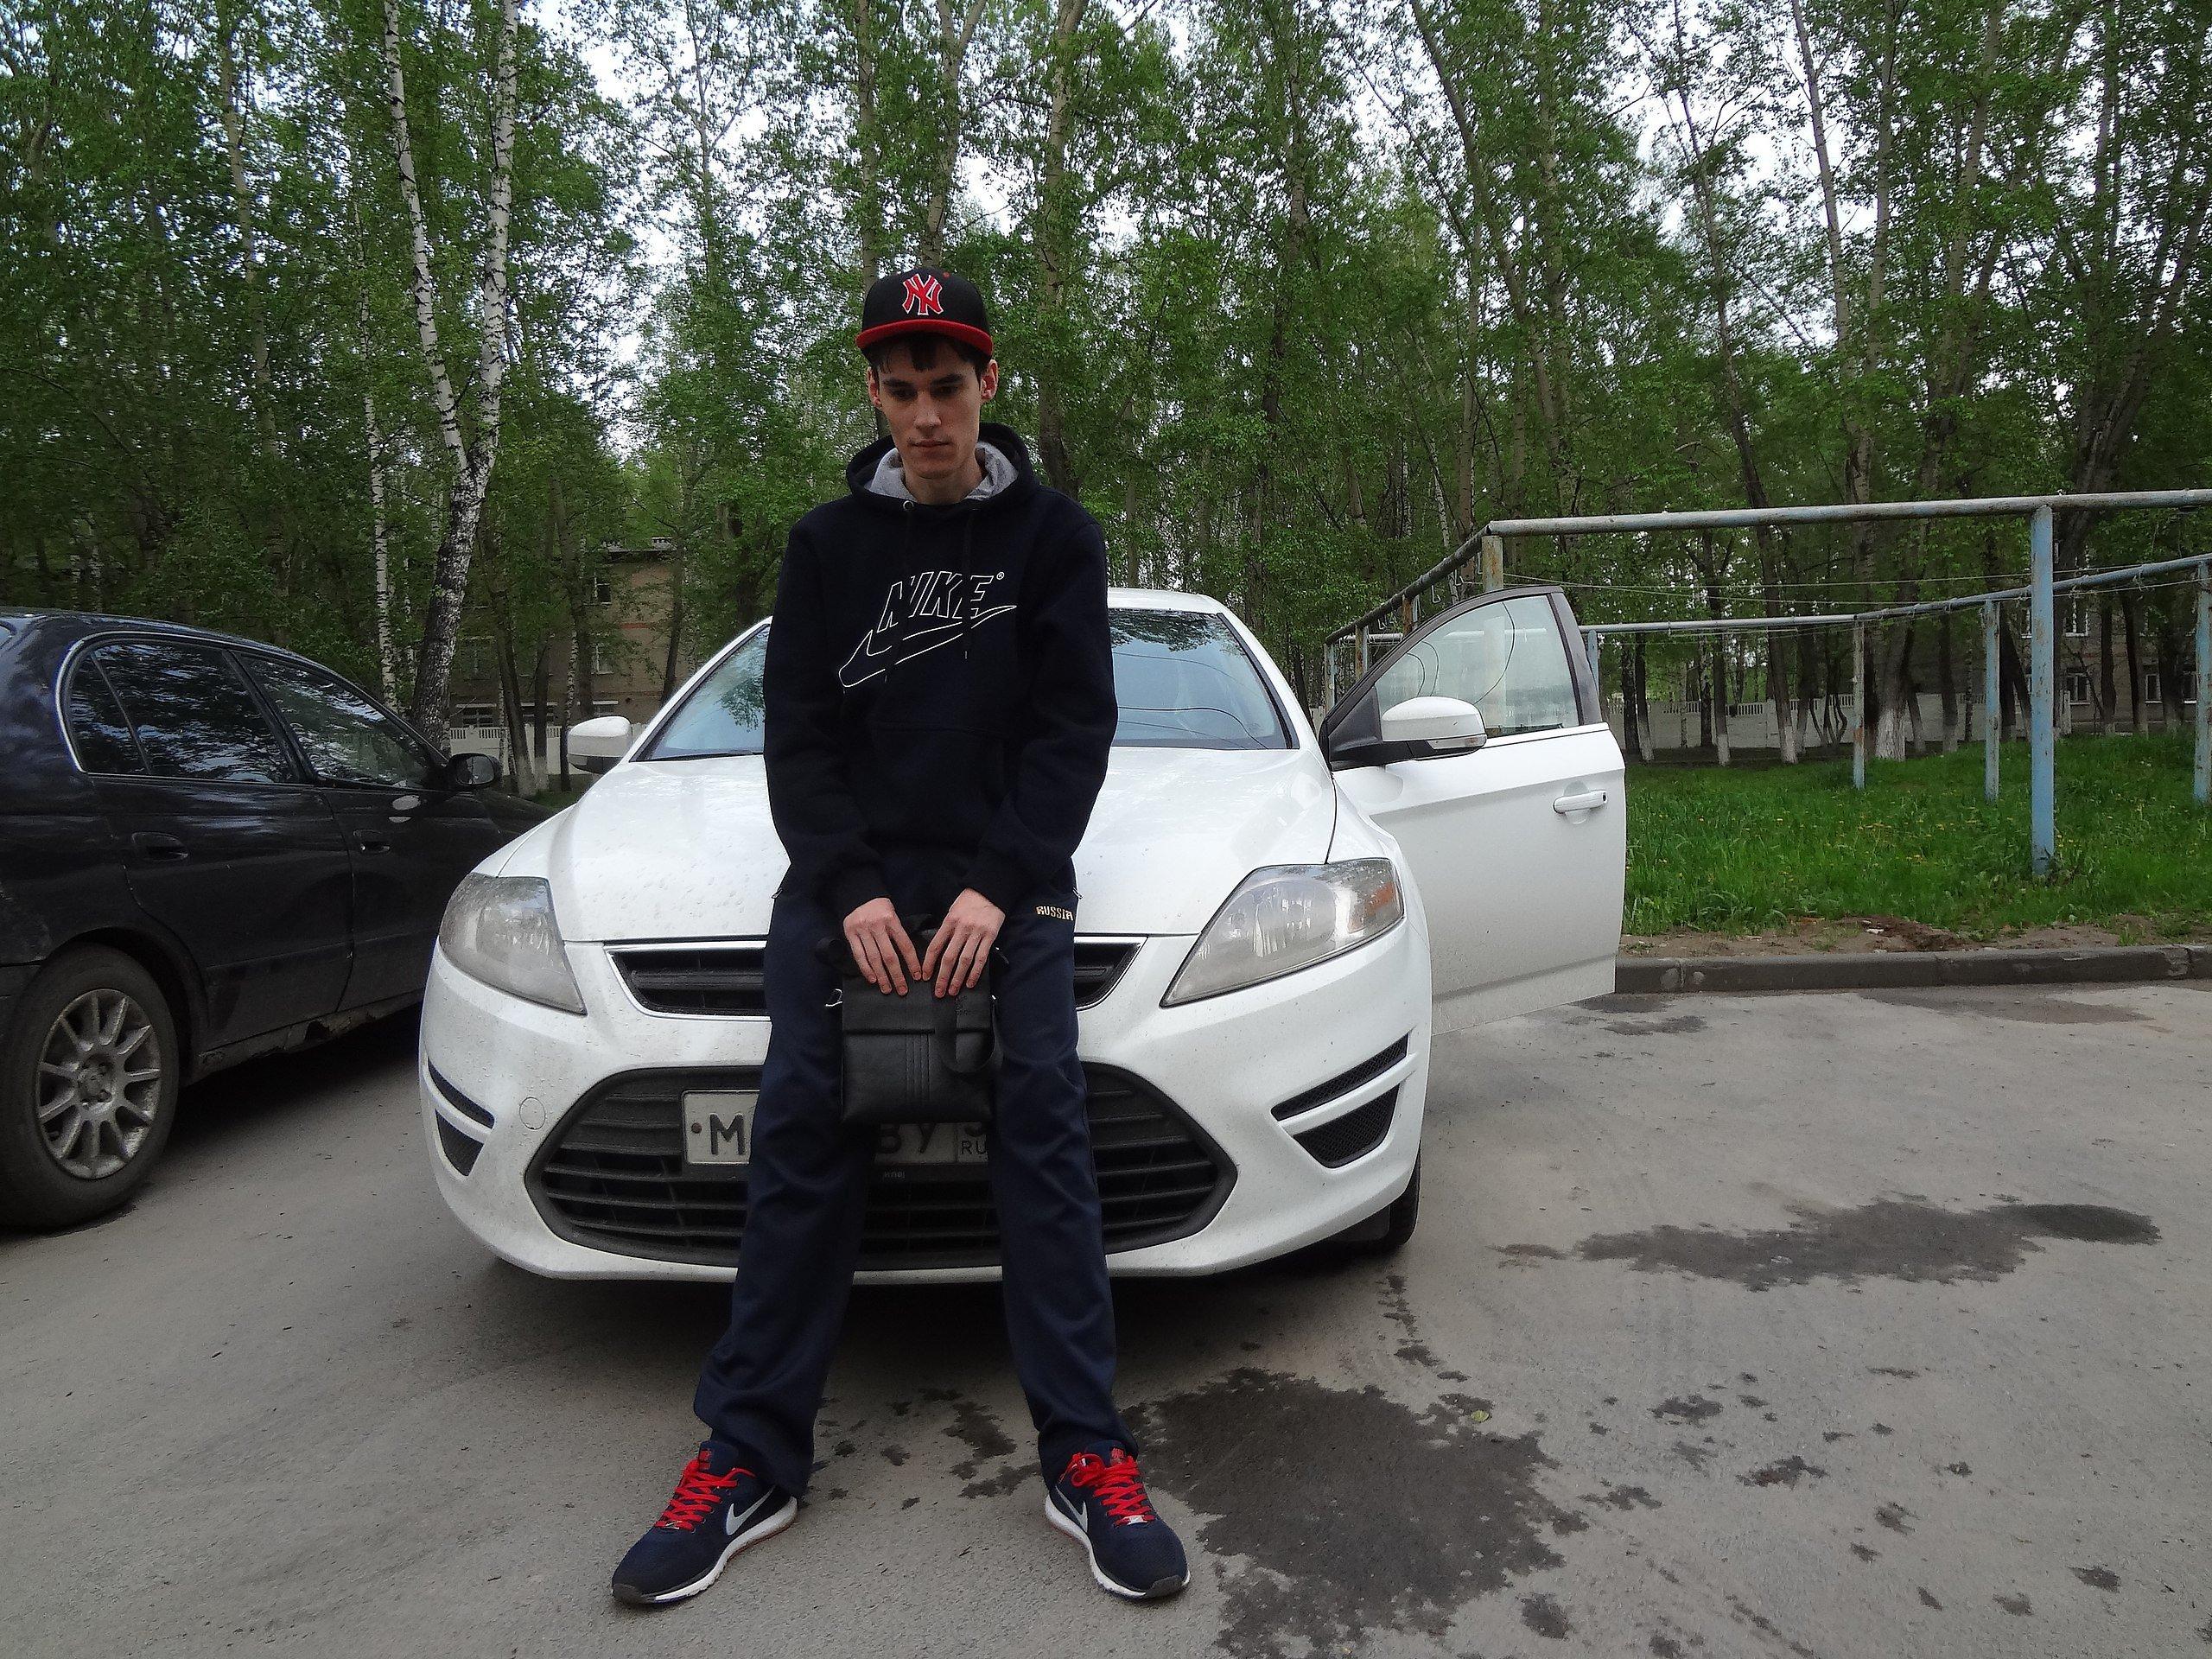 Фото крутых пацанов (21 фото) - LA mara Salvatrucha, 24 года, Новосибирск